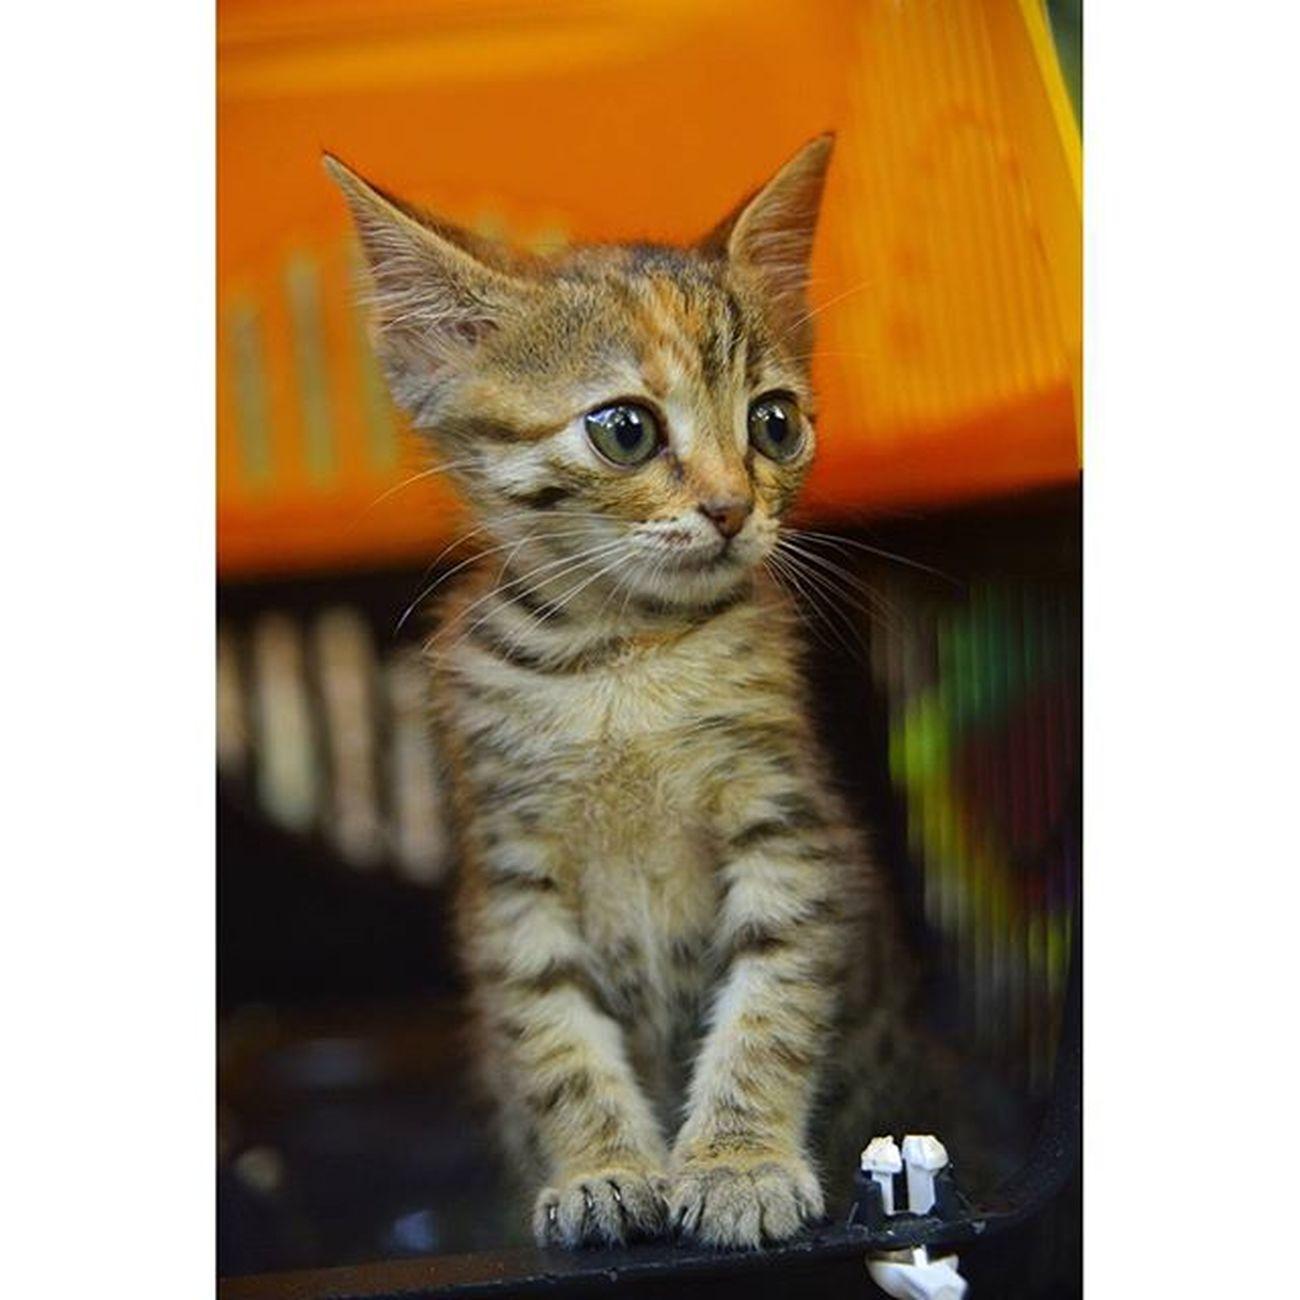 Günaydin Cat Cats Catstagram Catsofinstagram Catoftheday Animal Animals Animallovers Animales Kedizihni Kedizim Catstagram Cat Cats Kediciler Cirkinkedi Cirkinkediler